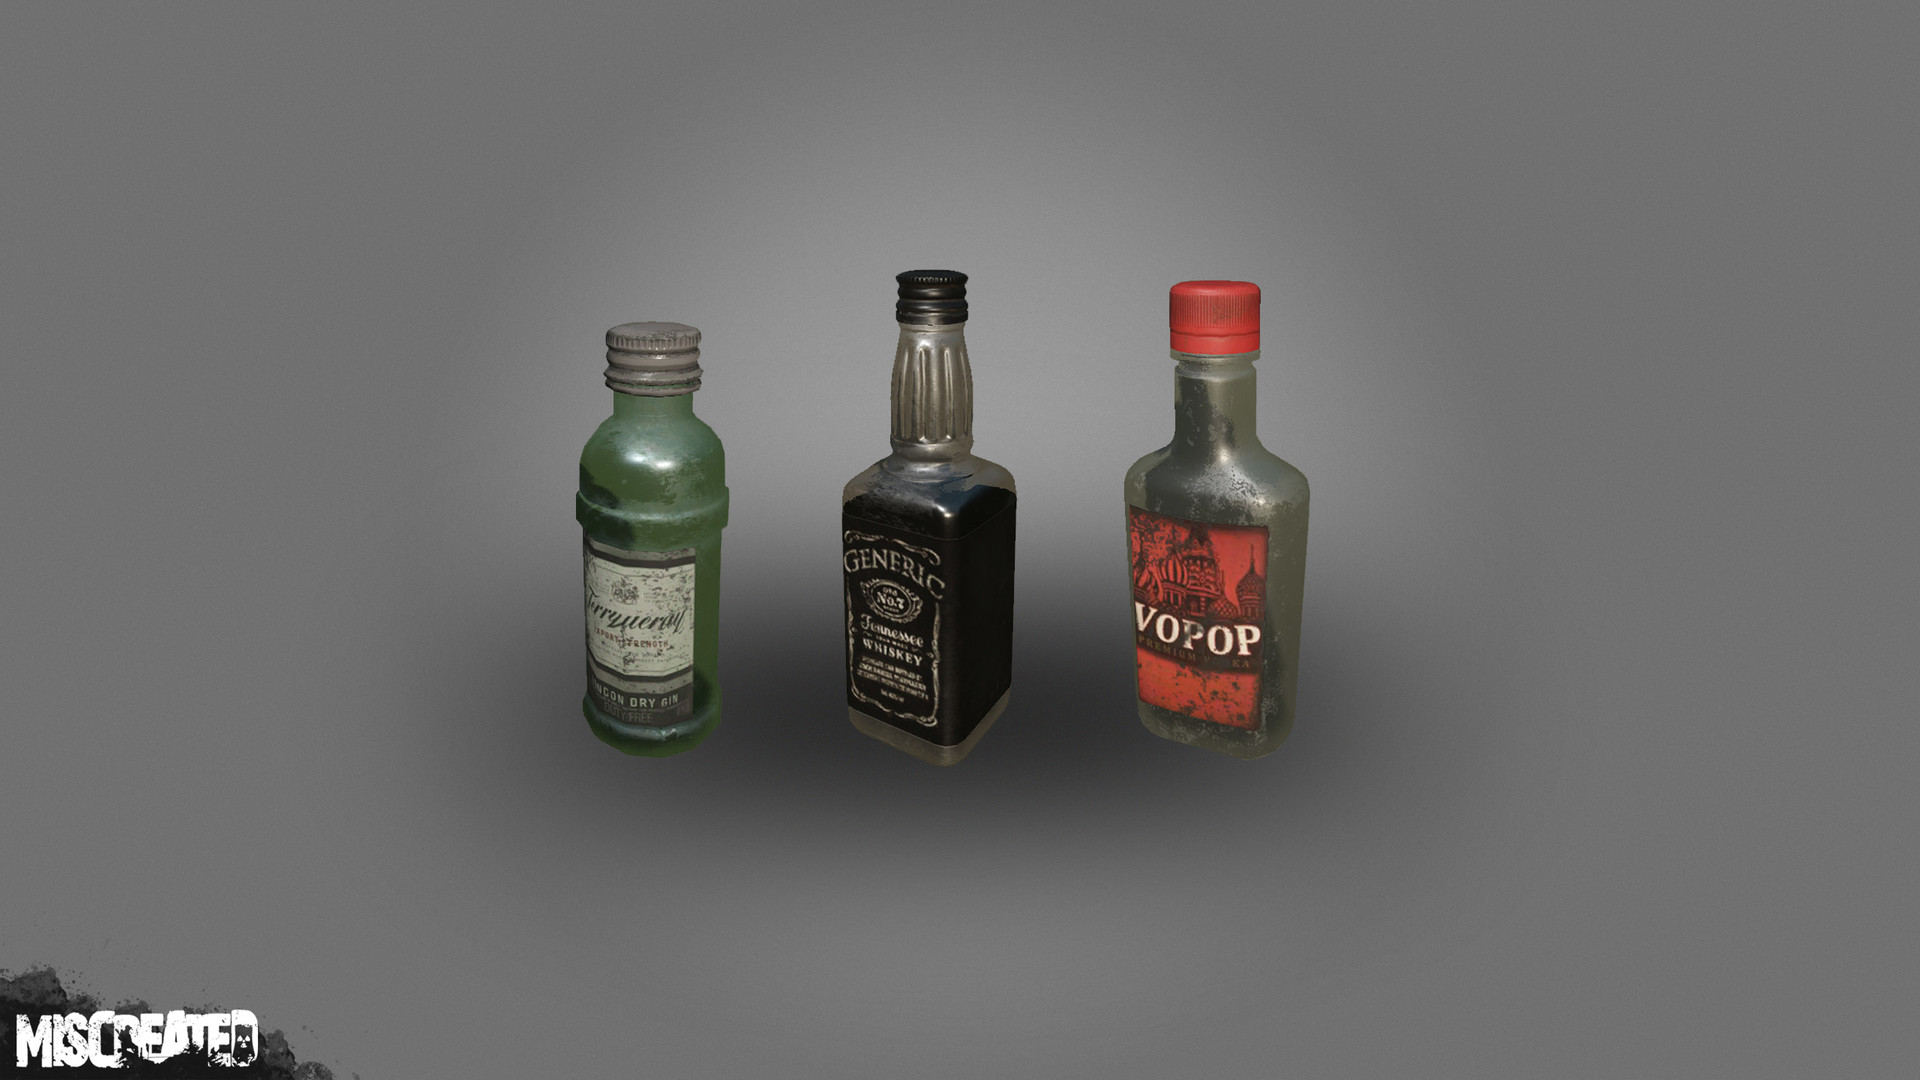 Carl kent alcohol bottles